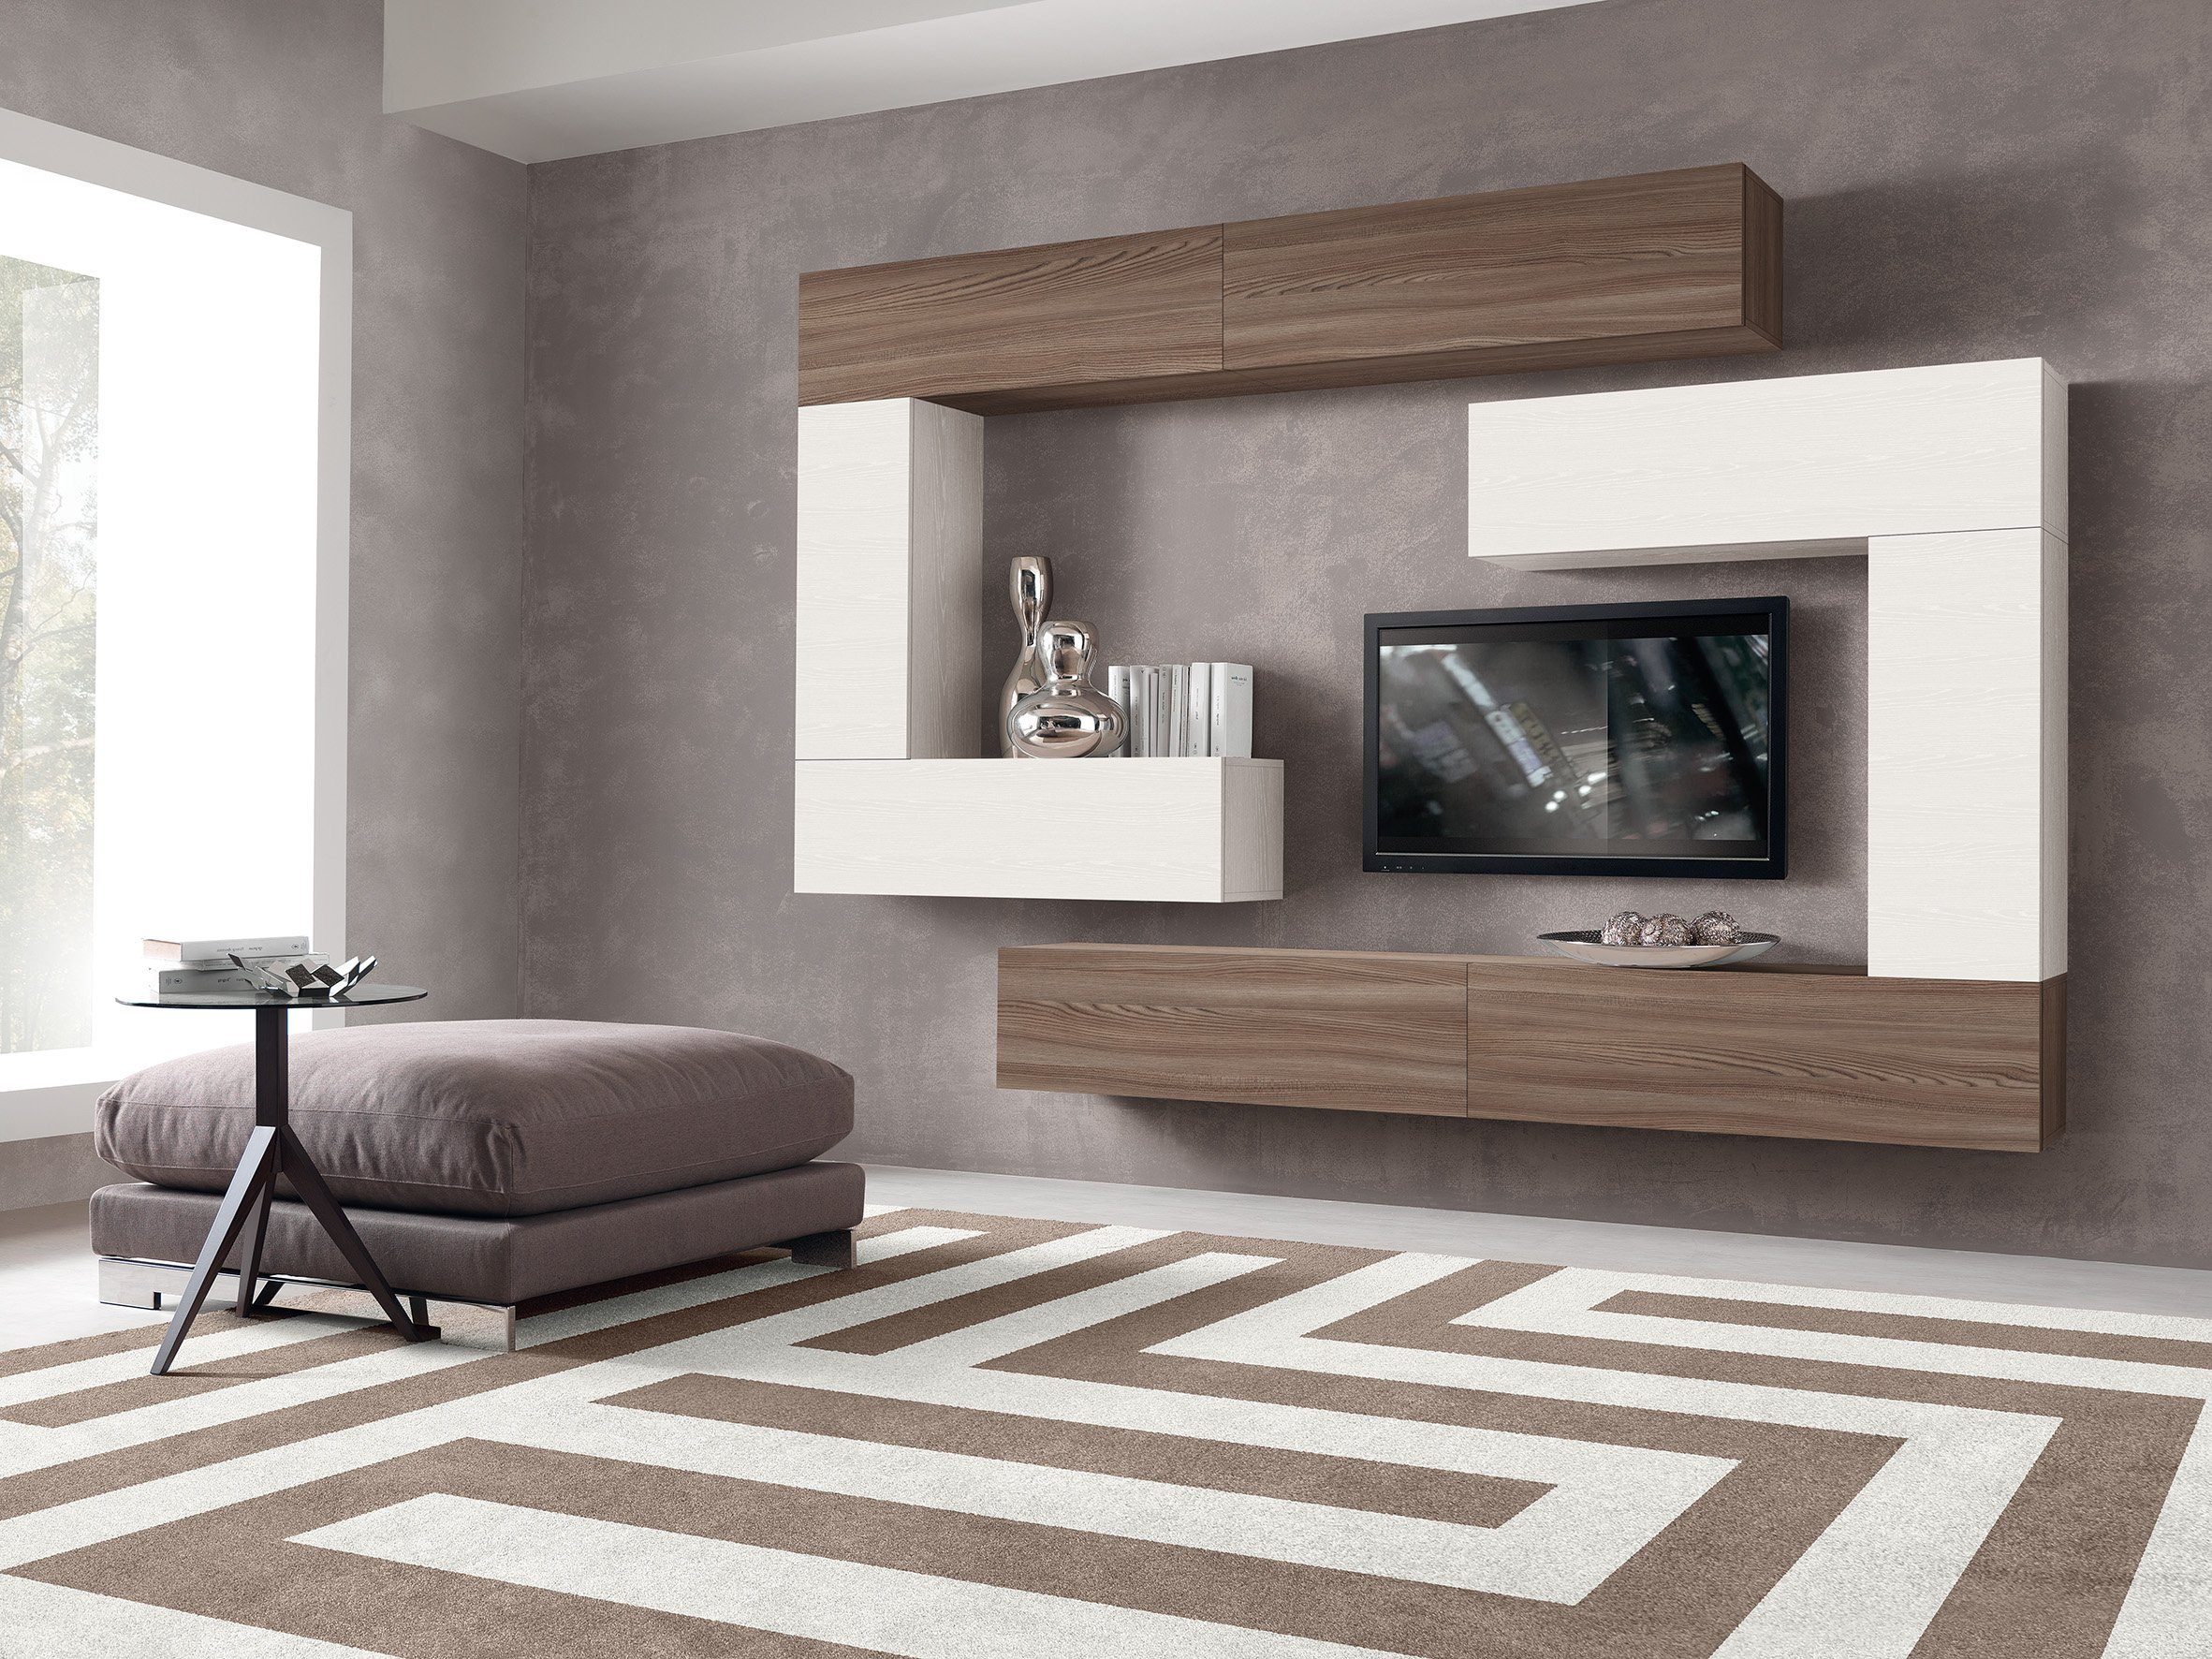 TV unit in matt white and woodgrain finish